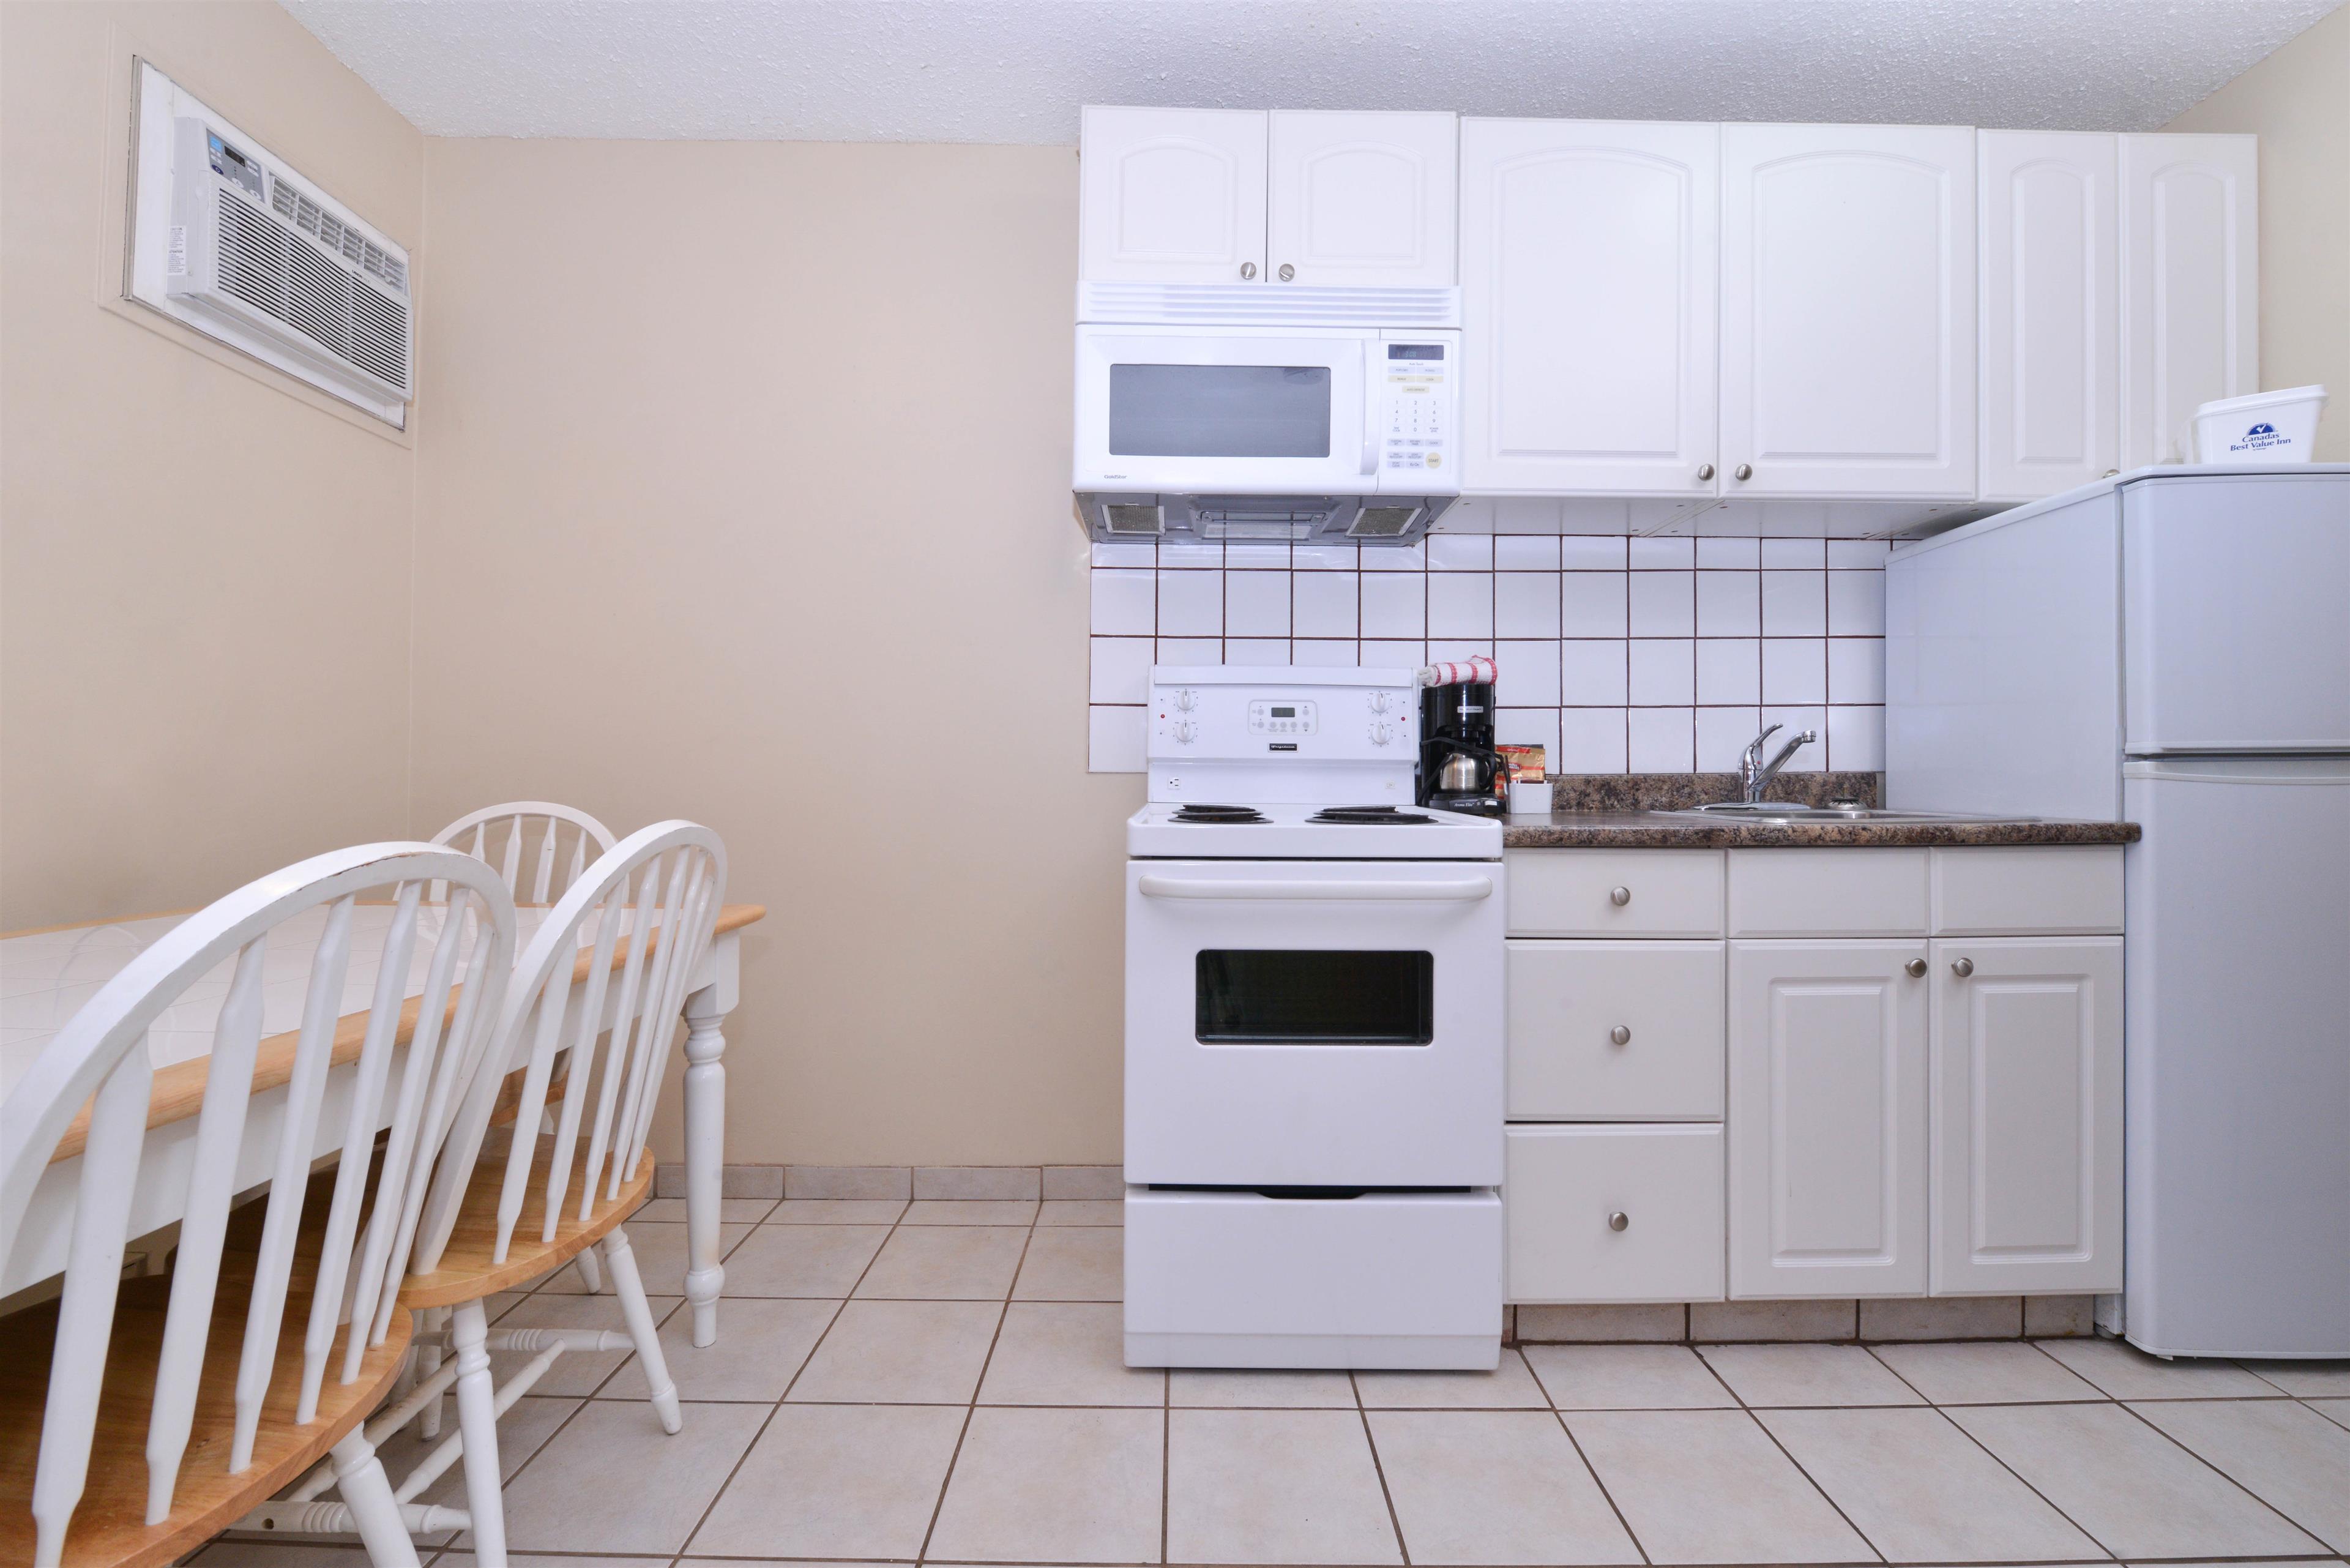 Canadas Best Value Inn & Suites in Vernon: One Queen Two Twin Beds Suite Amenities